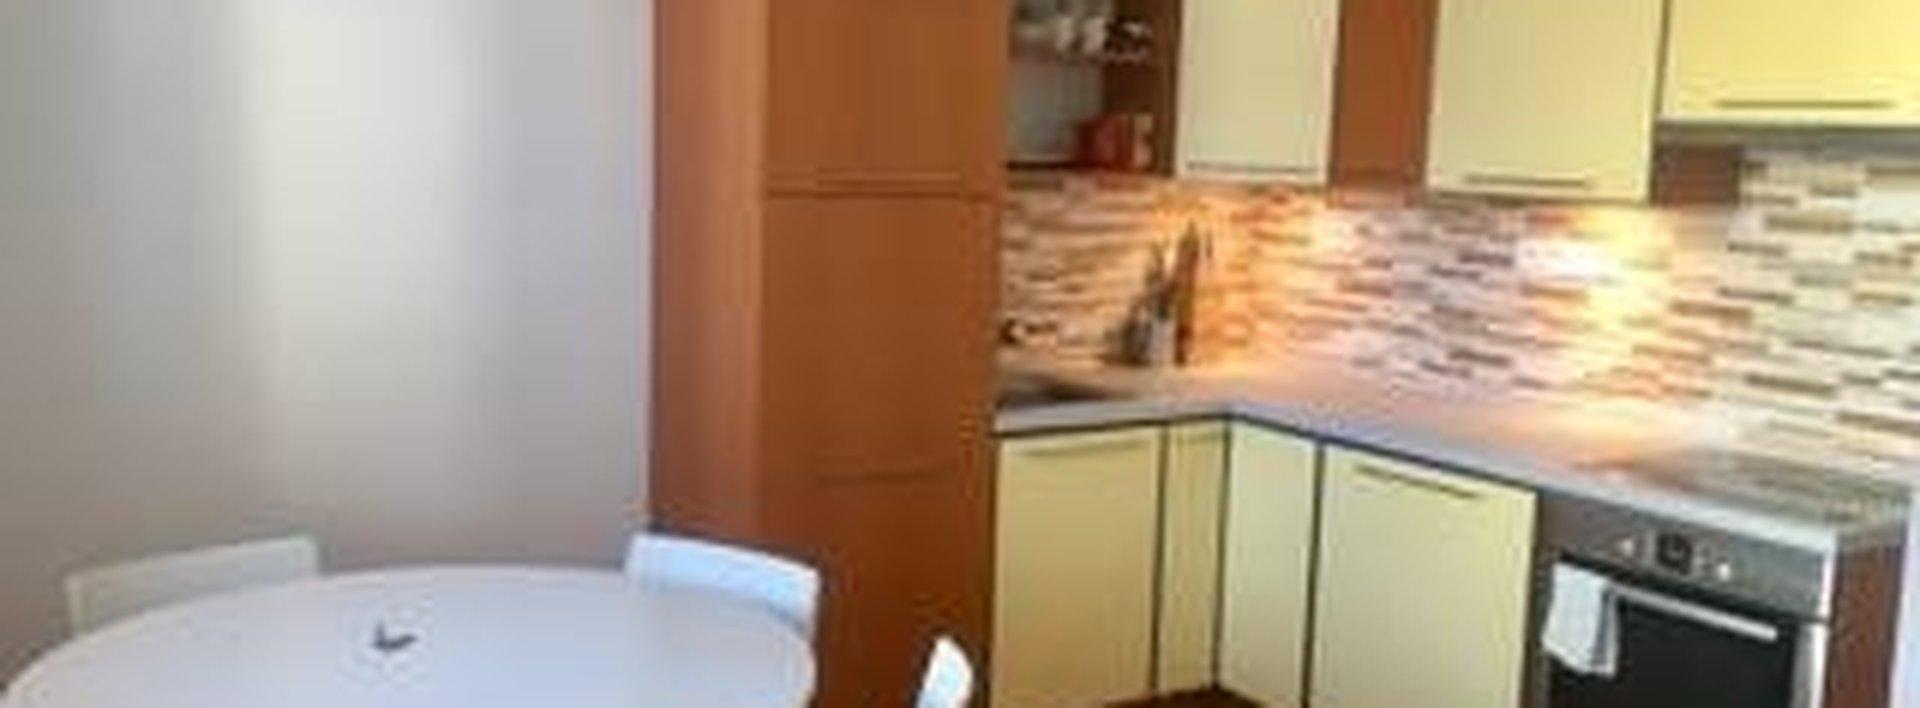 Pronájem bytu 2+kk, 28m² - Liberec - Jeřáb, ul. Slavíčkova, Ev.č.: N47931